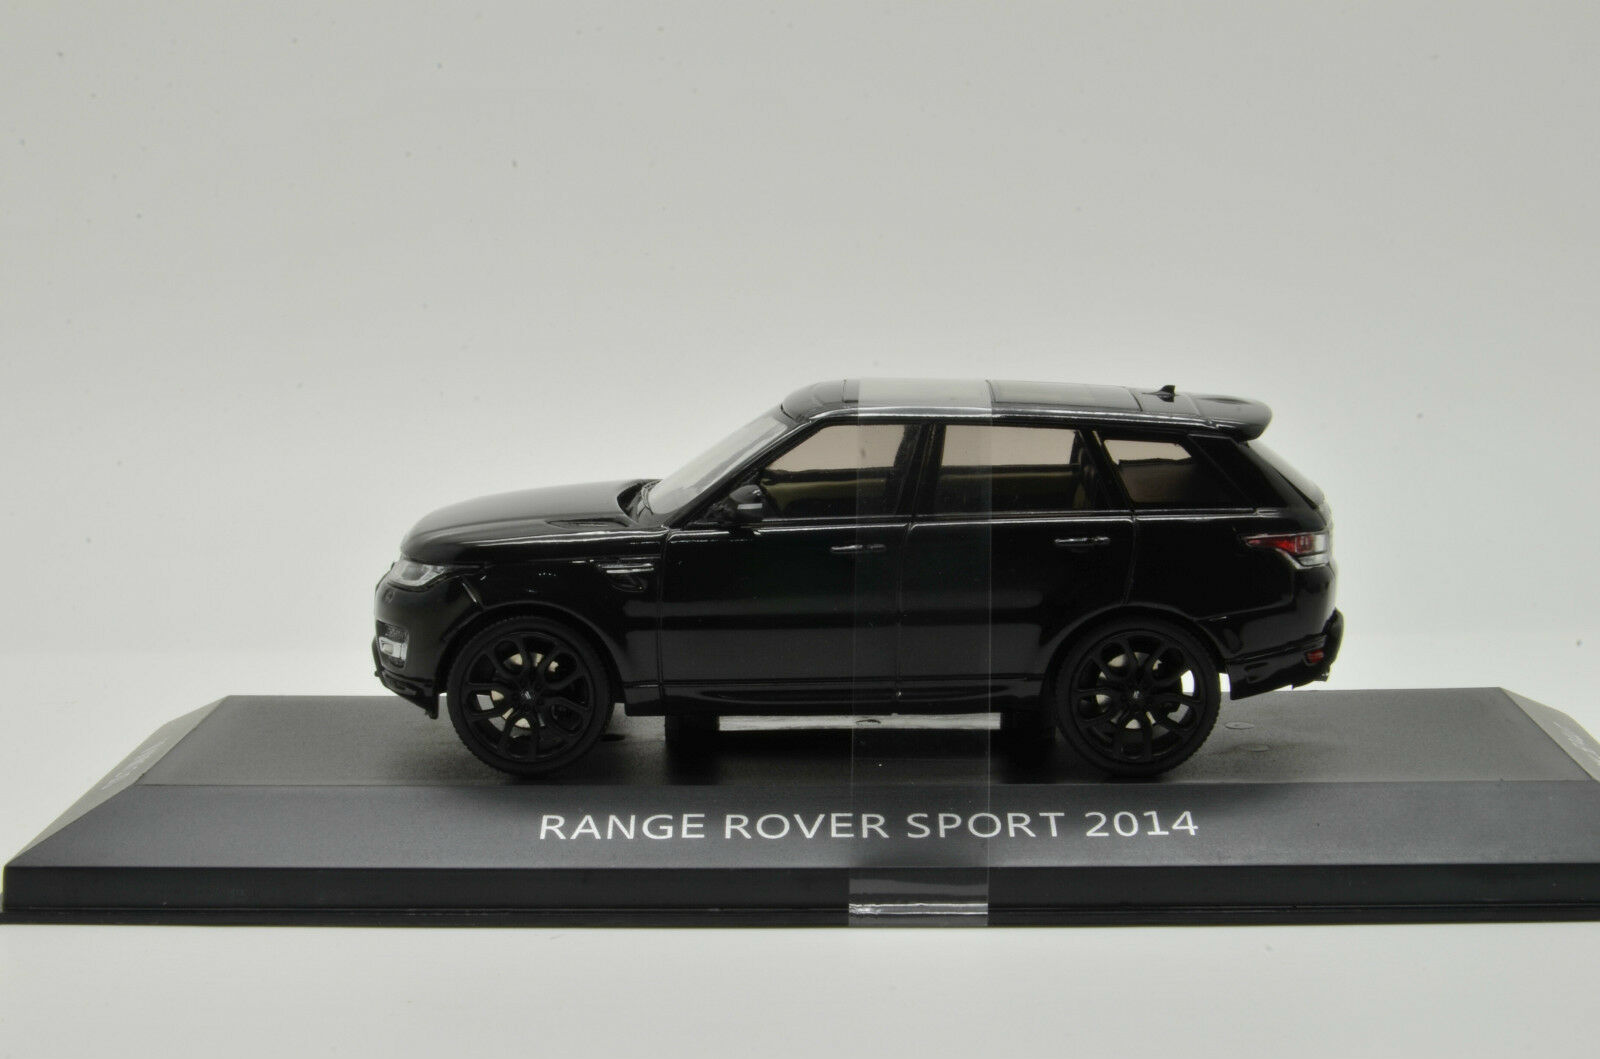 Raro  Range Range Range Rover Sport Edition 2014 VVM 110 PremiumX 1 43 6bff33